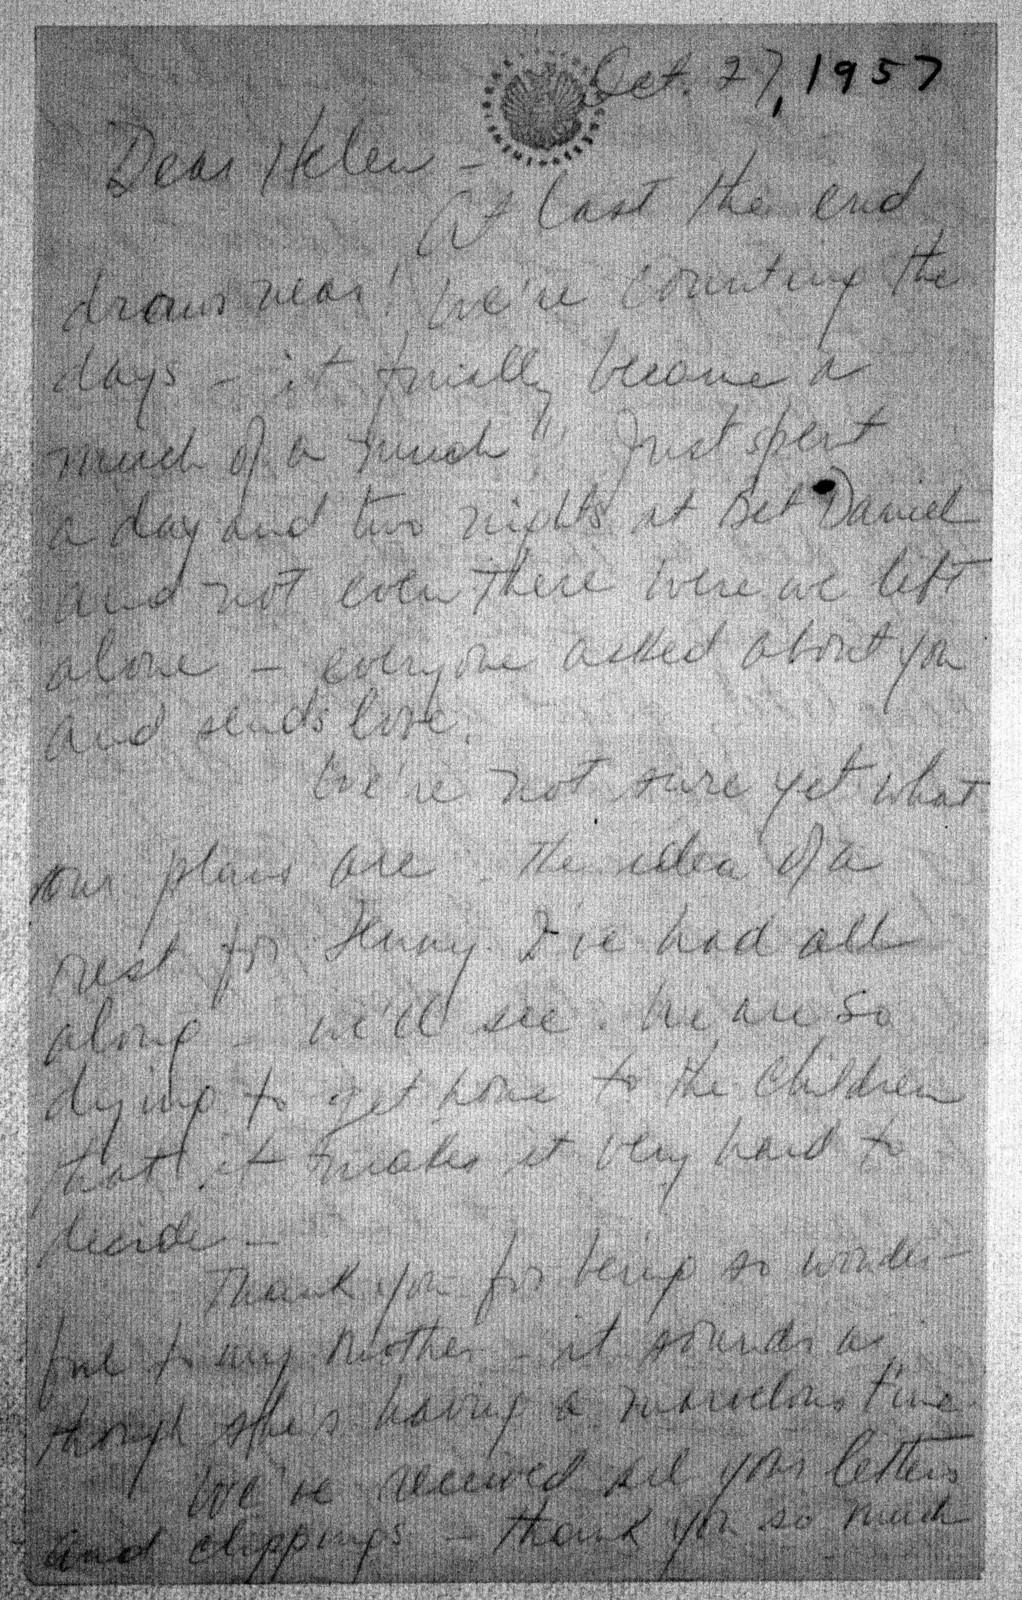 Letter from Felicia Bernstein to Helen Coates, October 27, 1957